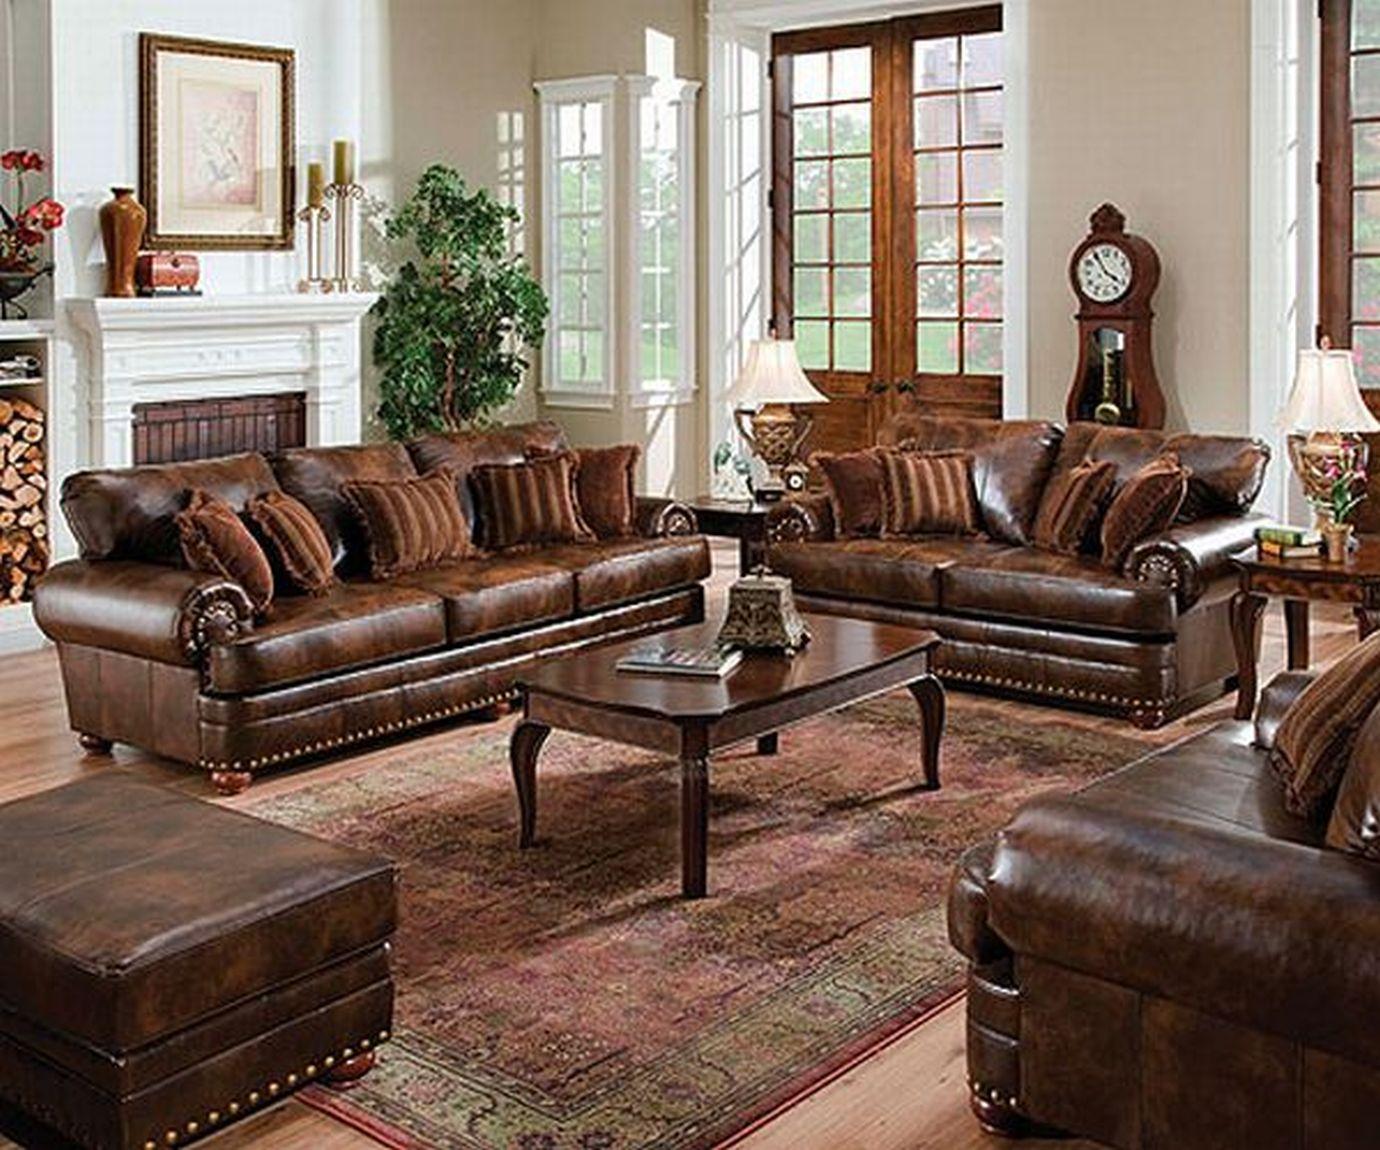 http://4.bp.blogspot.com/-WIWCynmXeWM/UGzzZ-nWXFI/AAAAAAAADEI/sIek6OnA4sM/s1600/furniture.jpg